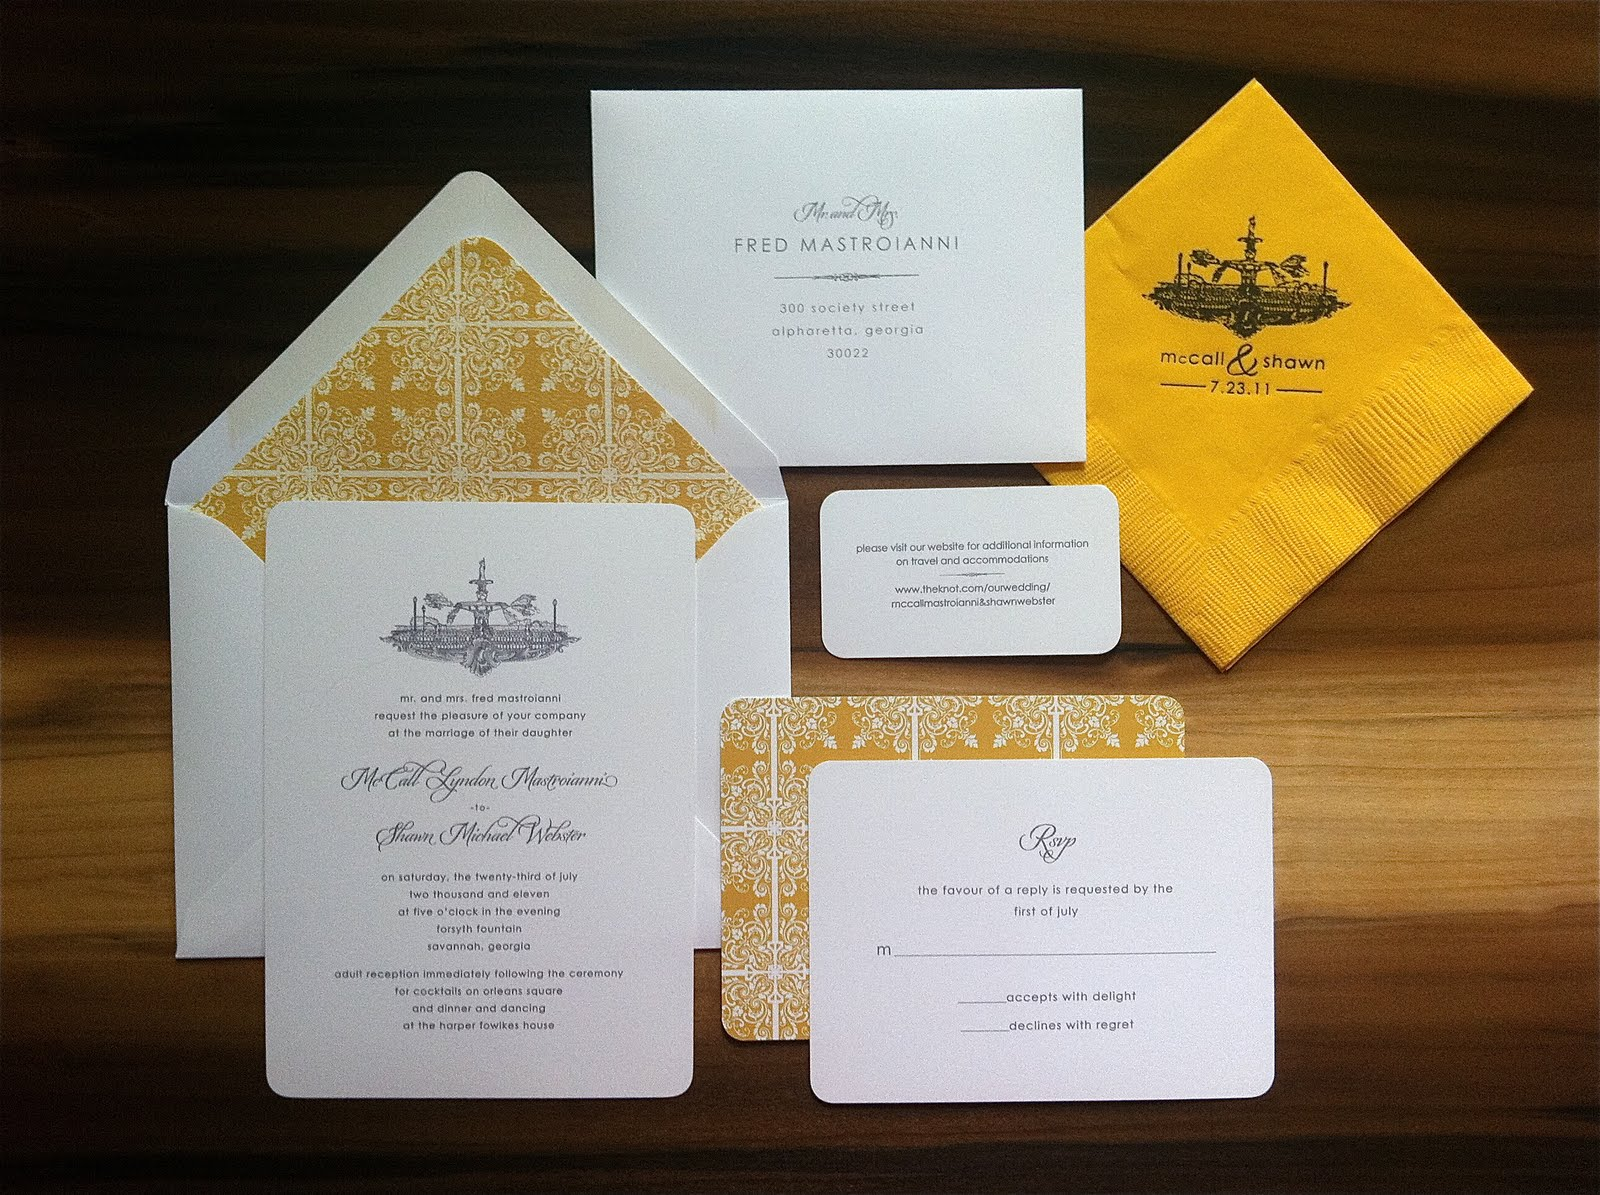 Savannah designer emily mccarthy blog wedding invitations wedding invitations forsyth fountain savannah ga stopboris Images